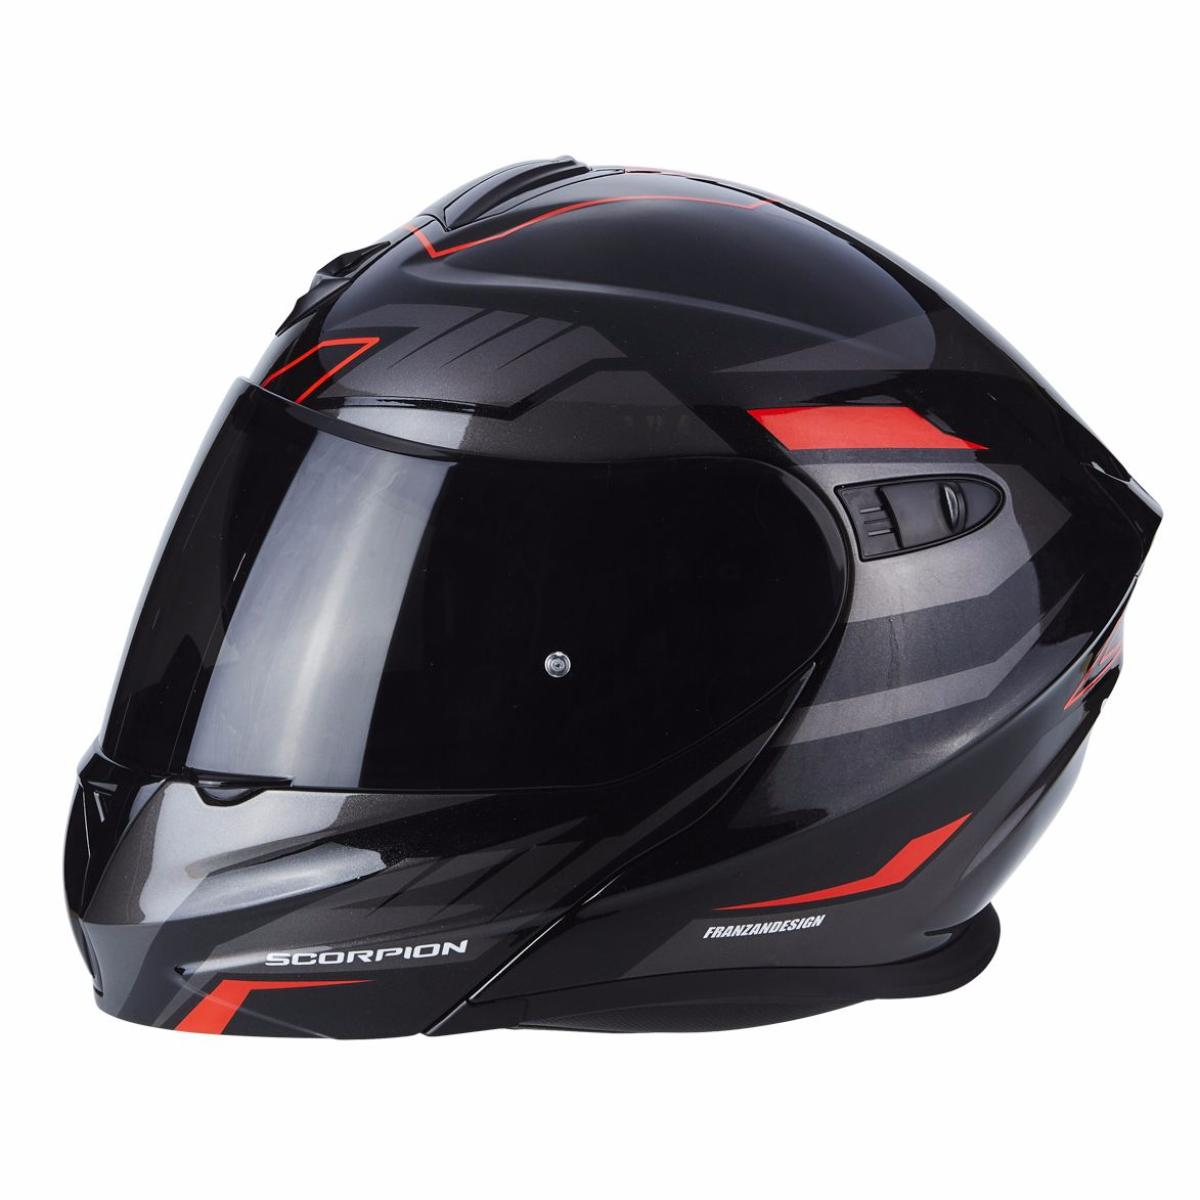 casque moto modulable scorpion exo 920 shuttle noir rouge. Black Bedroom Furniture Sets. Home Design Ideas